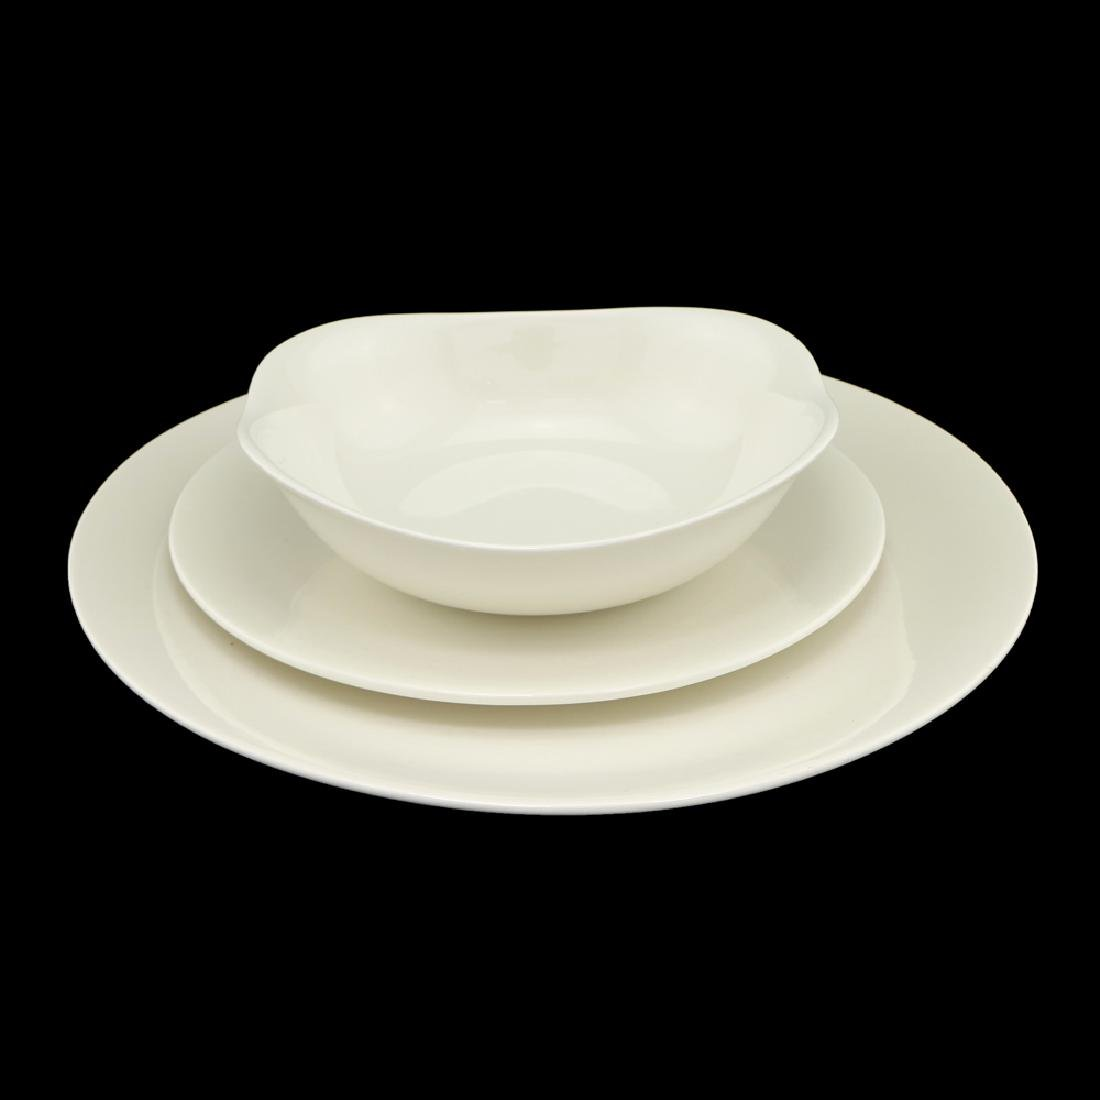 4 Zeisel Classic Century Serving Items (2005) - 3